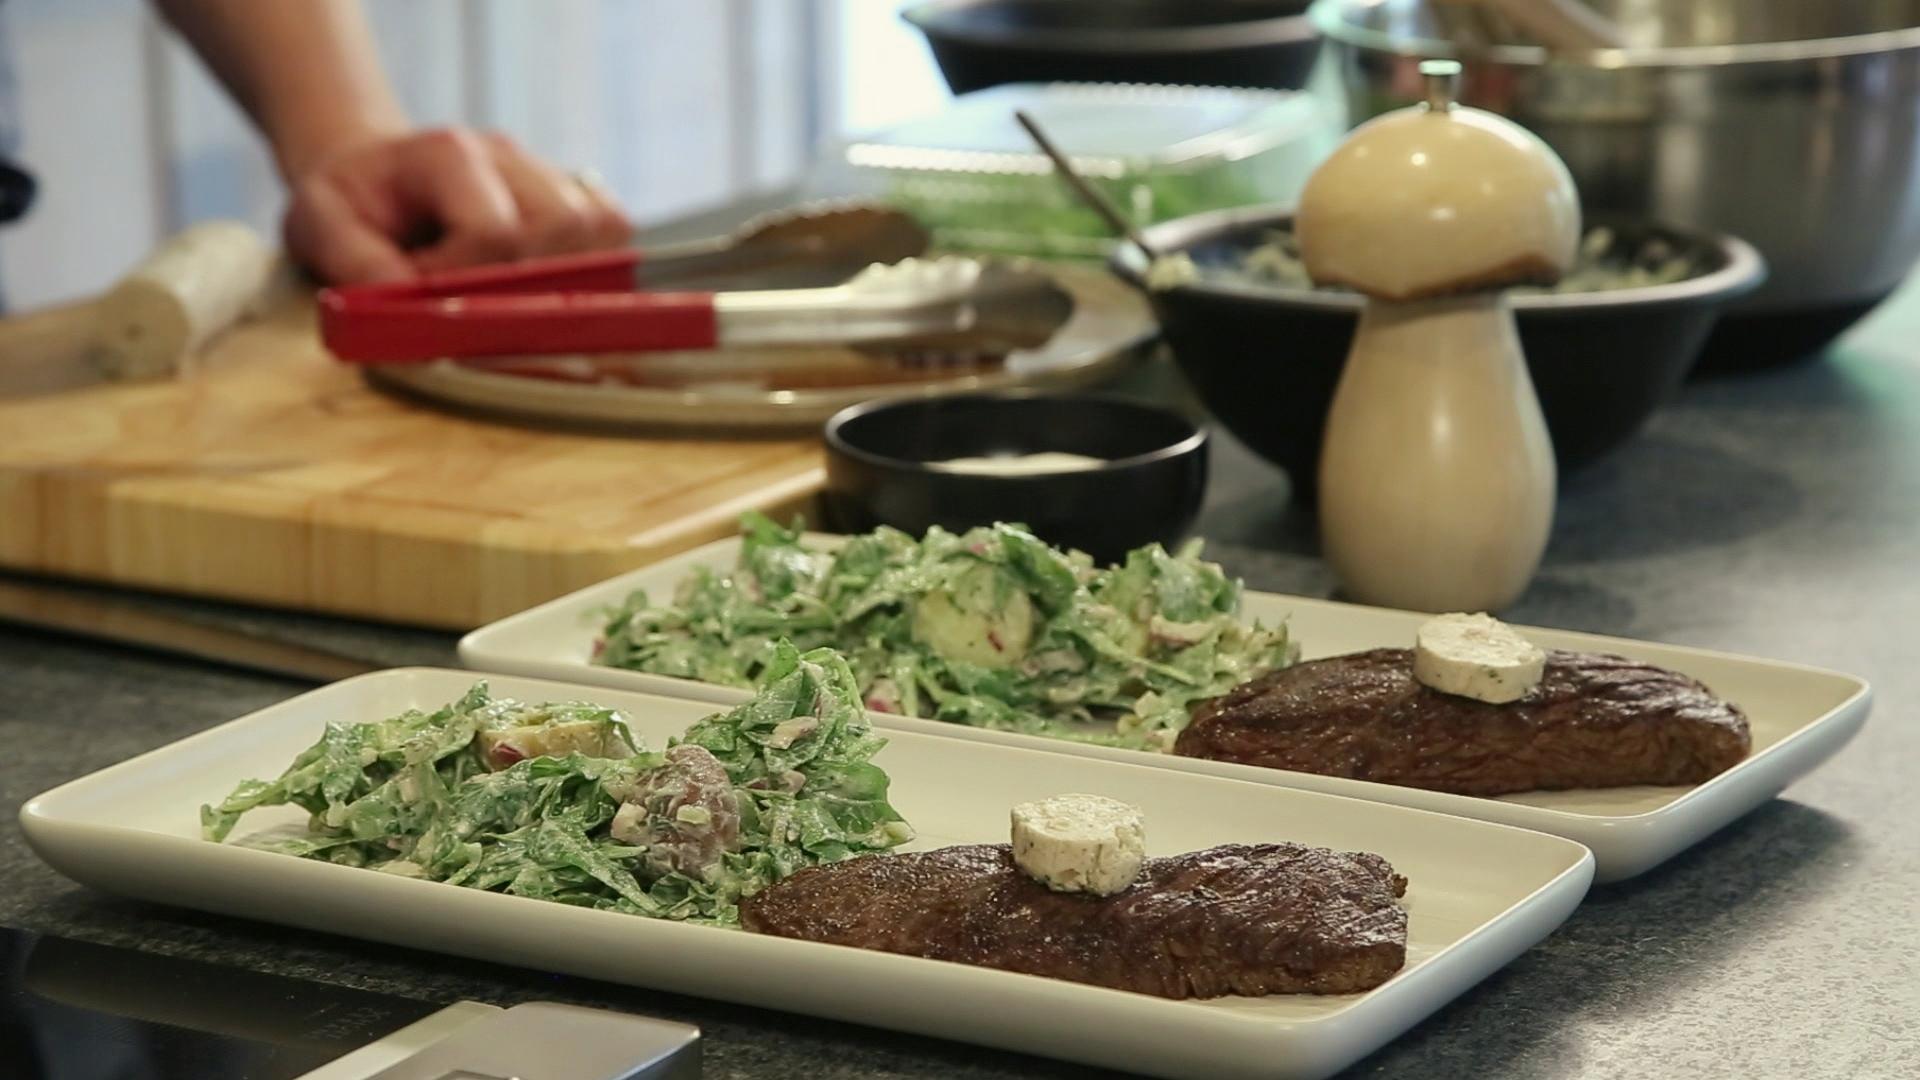 la cuisine par arnaud marchand bavette de b uf et salade. Black Bedroom Furniture Sets. Home Design Ideas